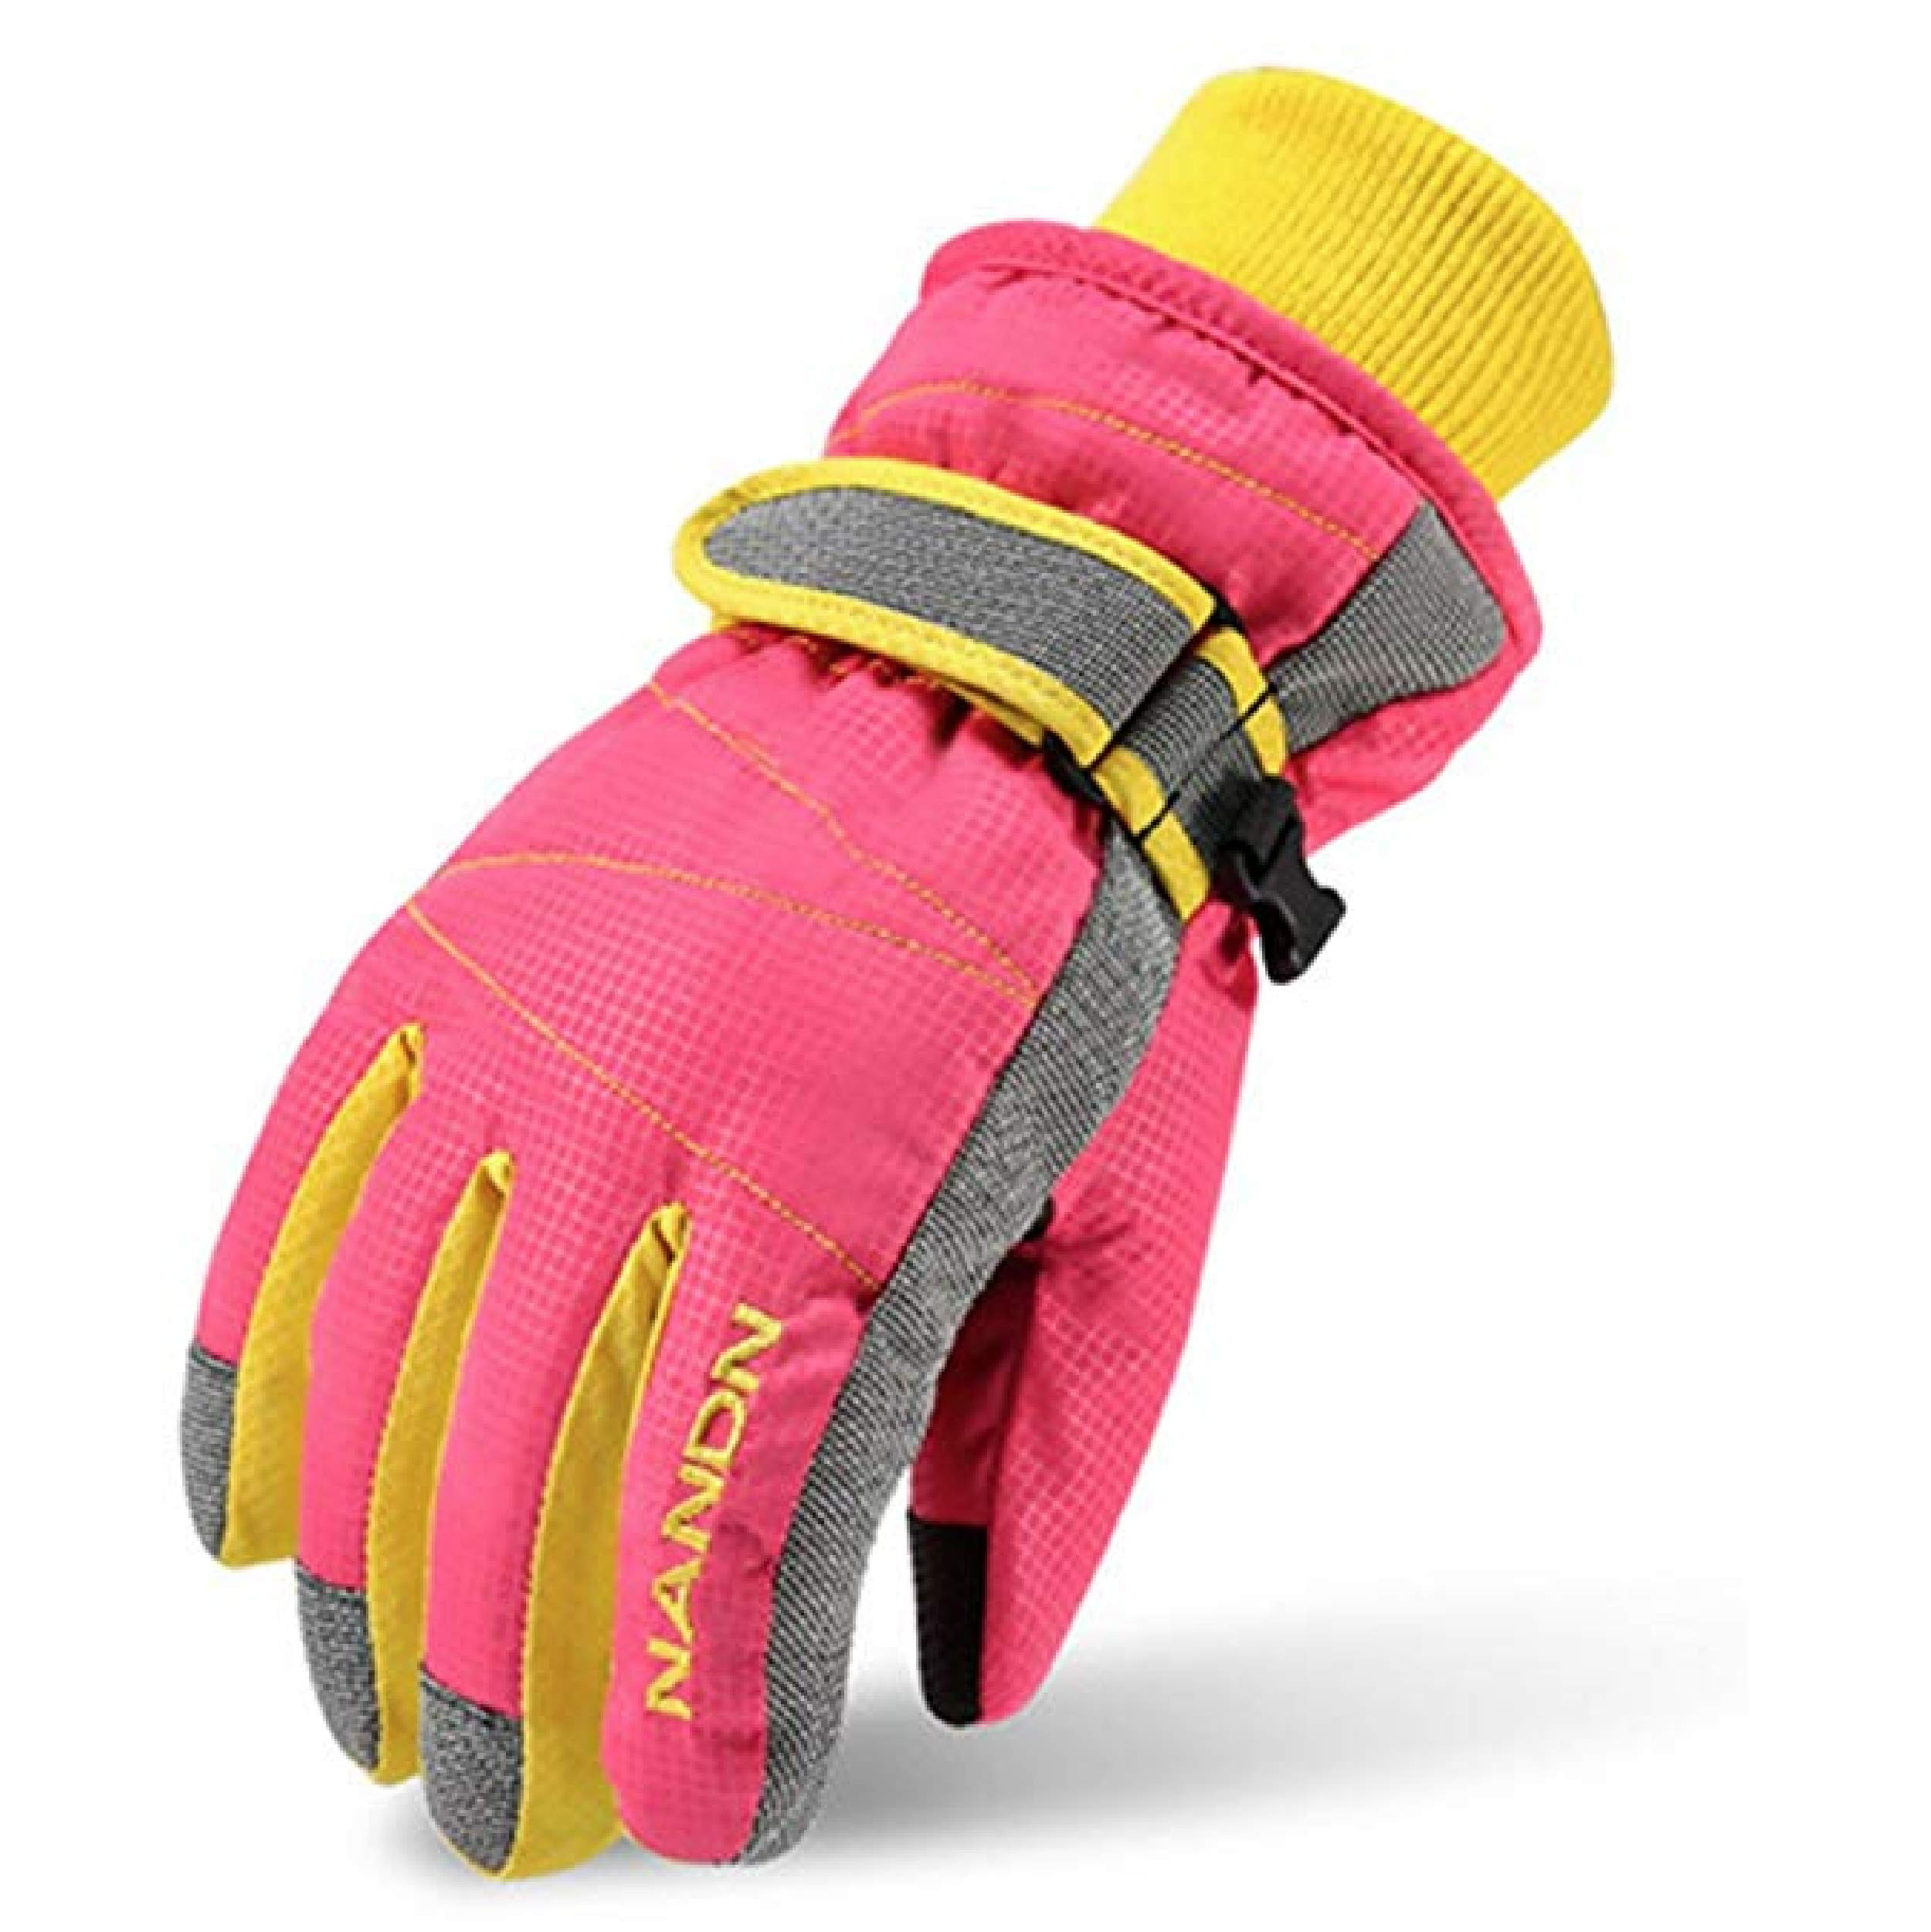 Windproof Snowboard Winter Warm Gloves Thermal Fleece Snow Gloves for Boys Girls TRIWONDER Ski Gloves for Kids